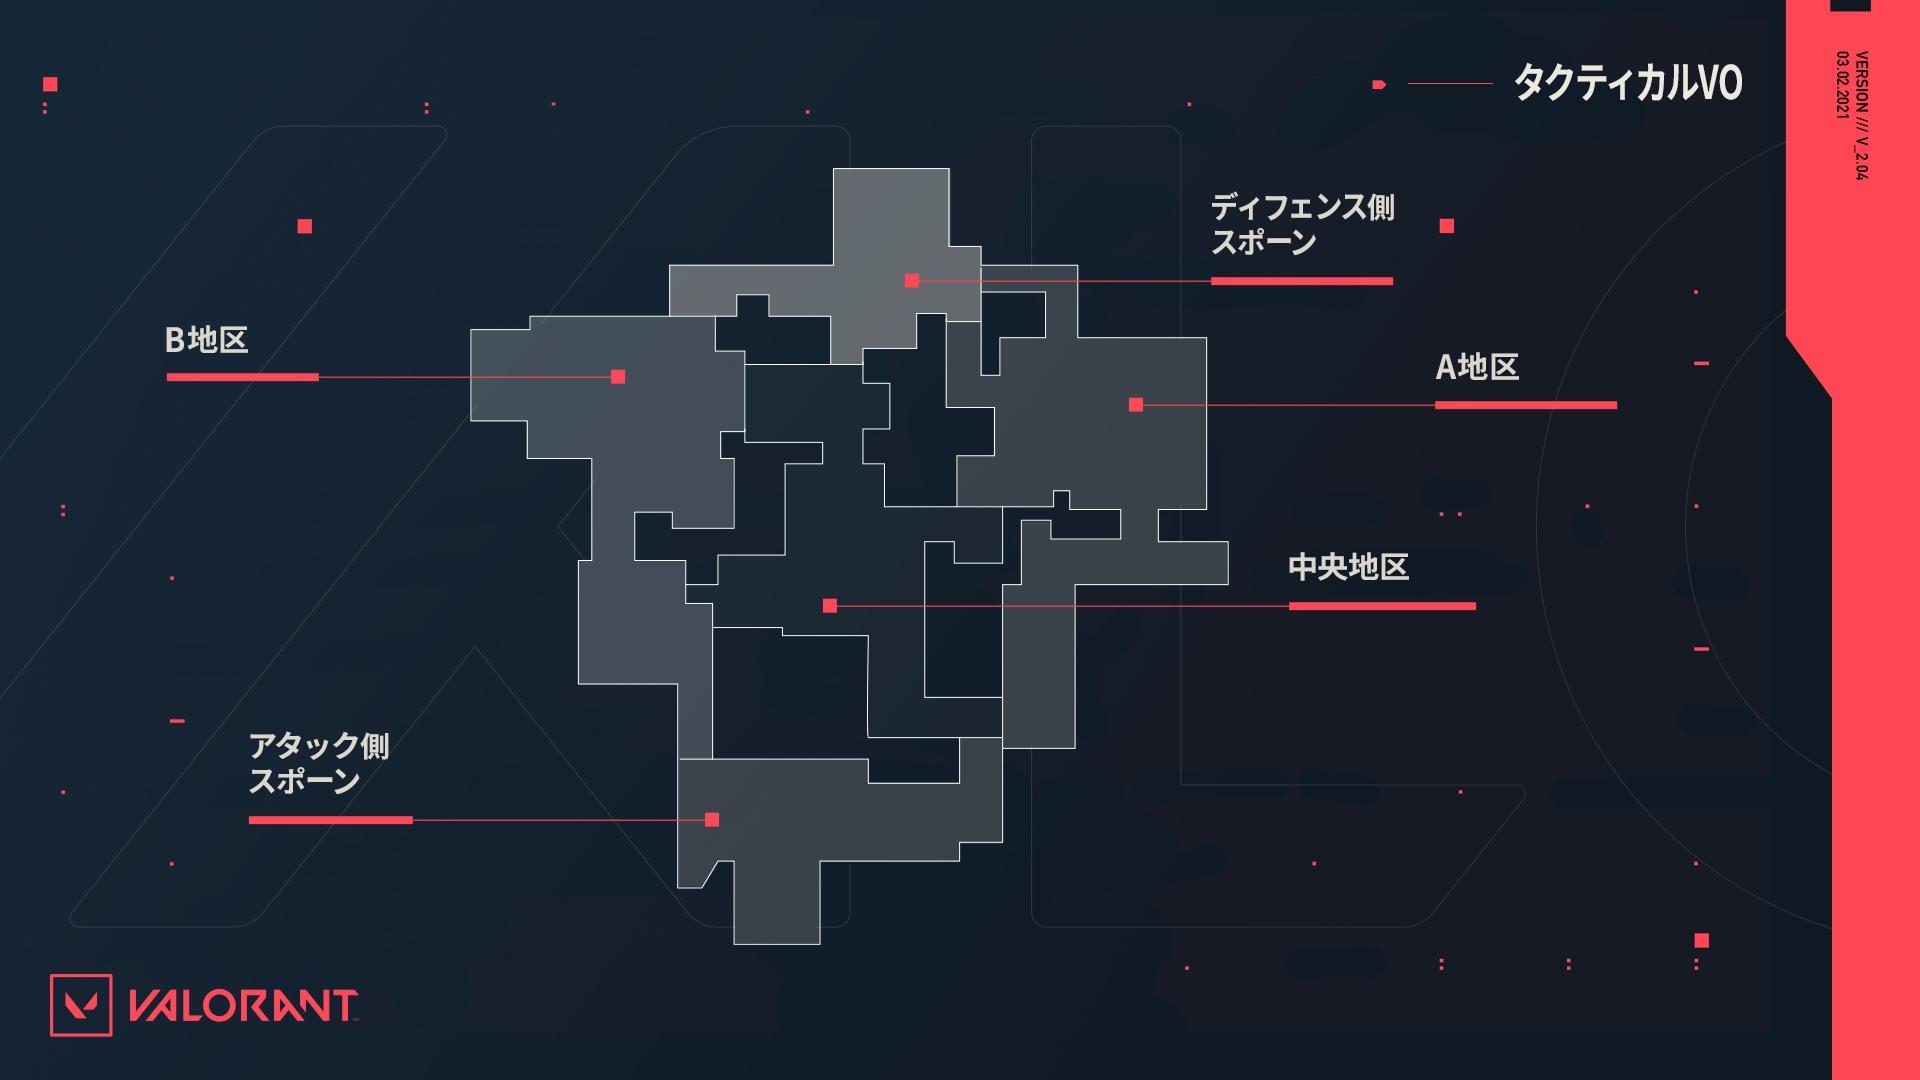 Tactical_VO_JA.jpg